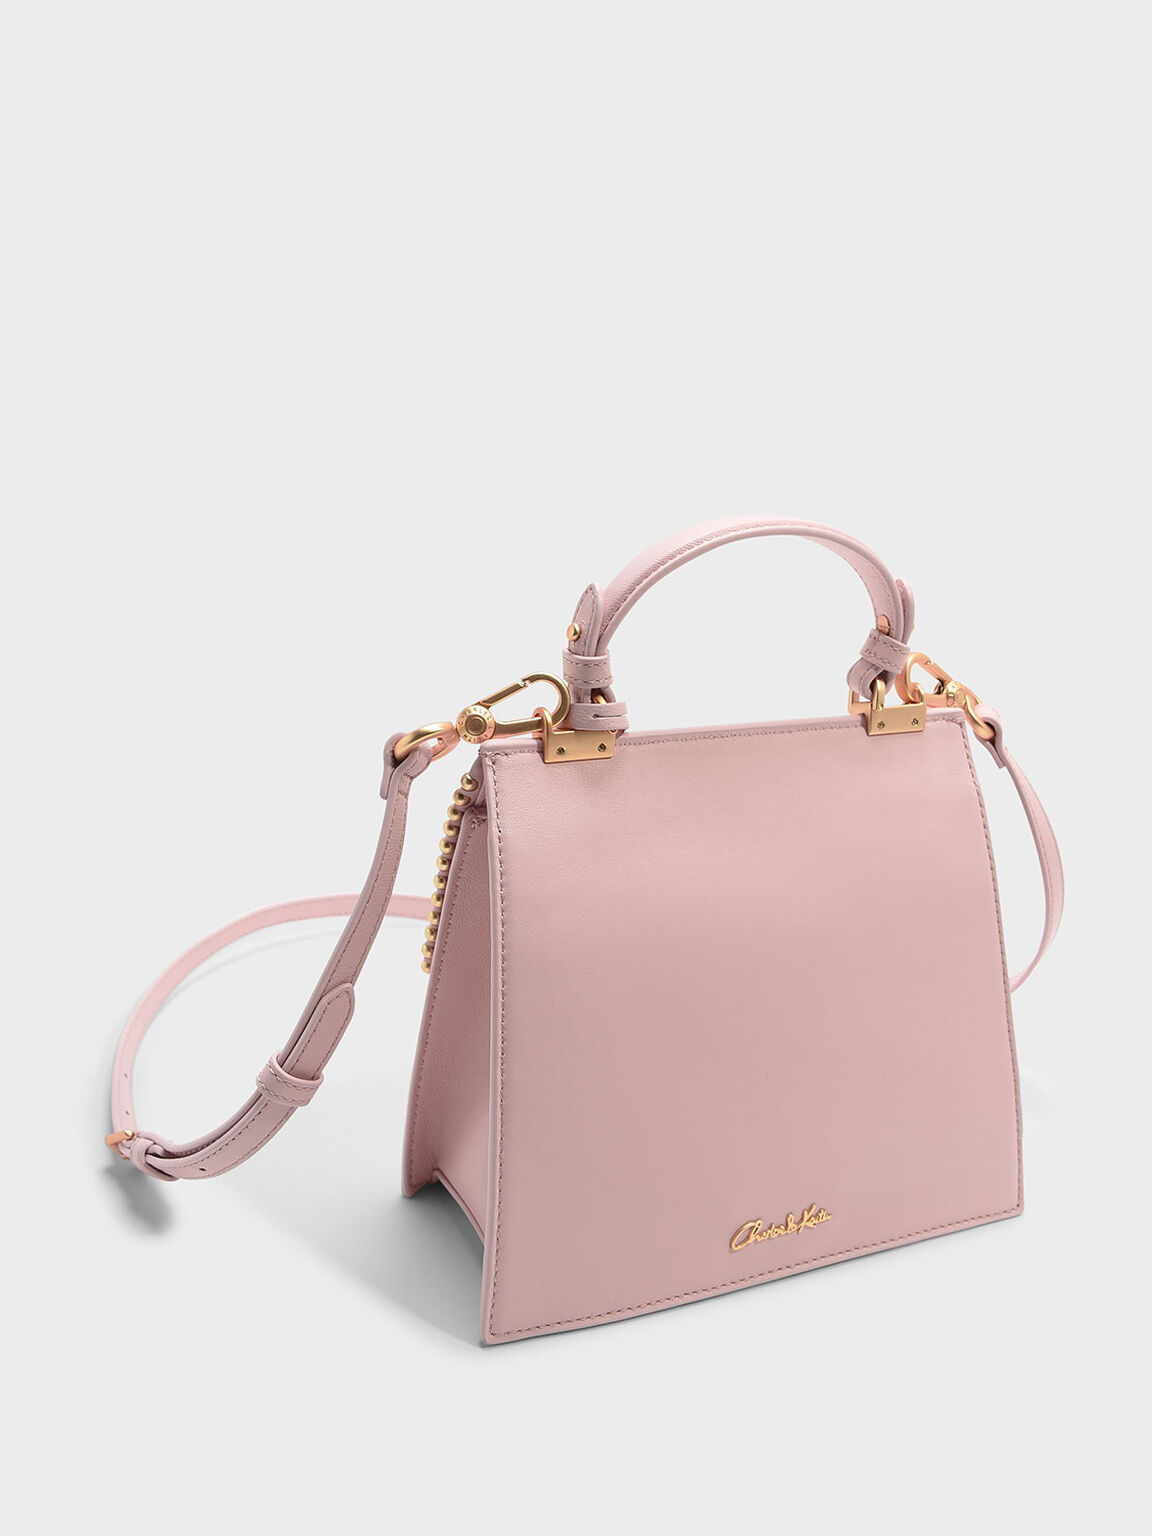 Bead Detail Leather Front Flap Bag, Pink, hi-res